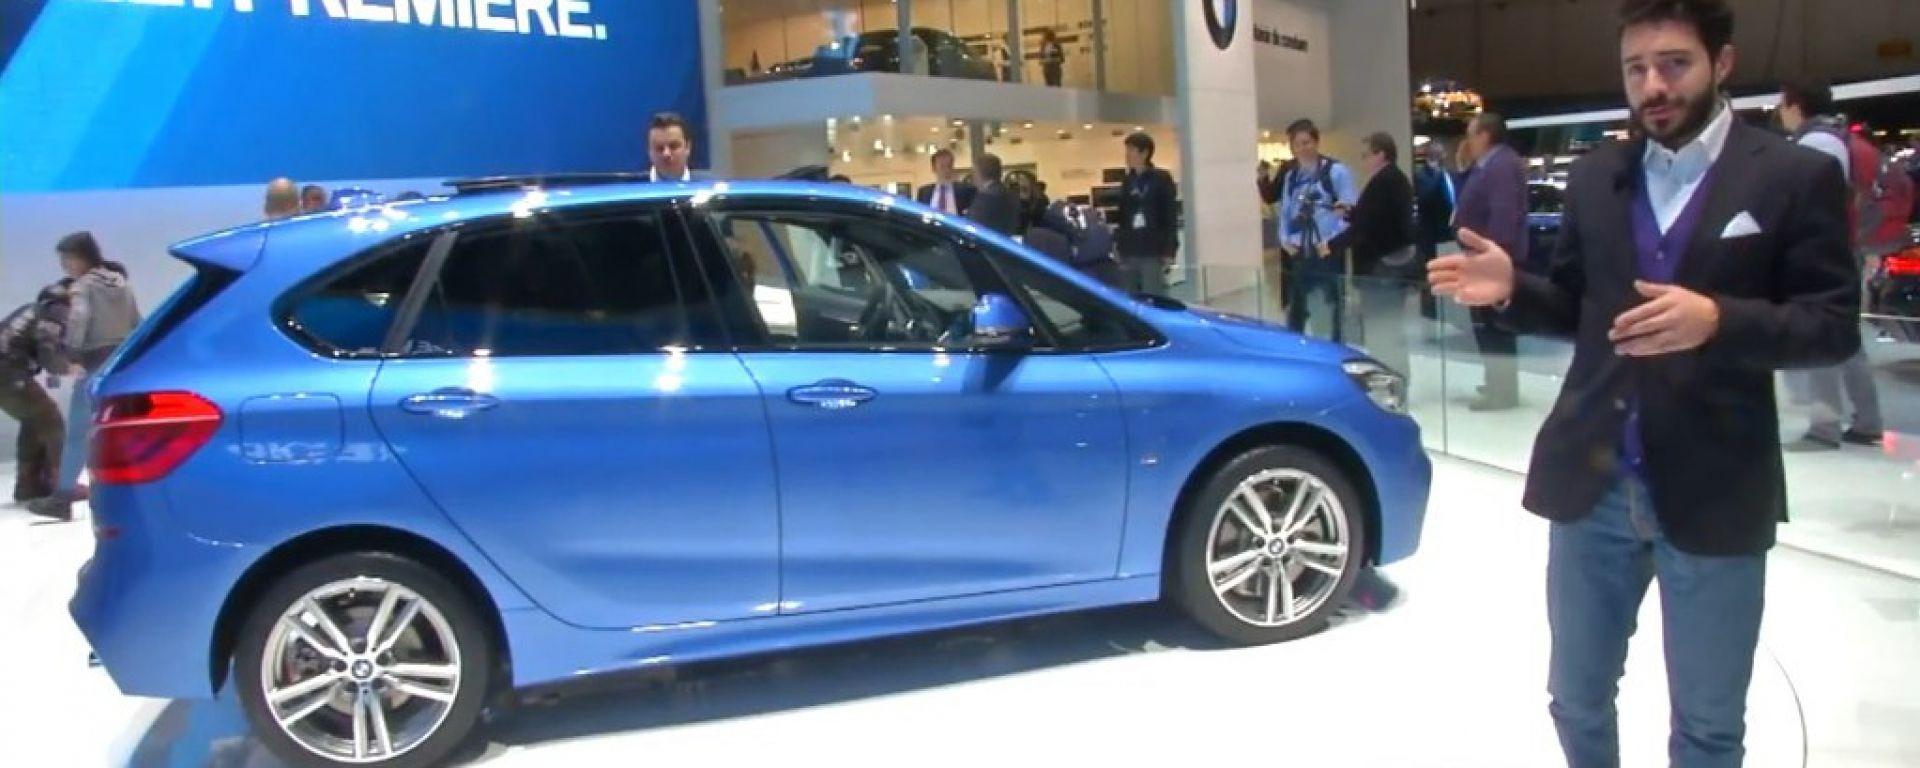 Salone di Ginevra 2014, lo stand BMW